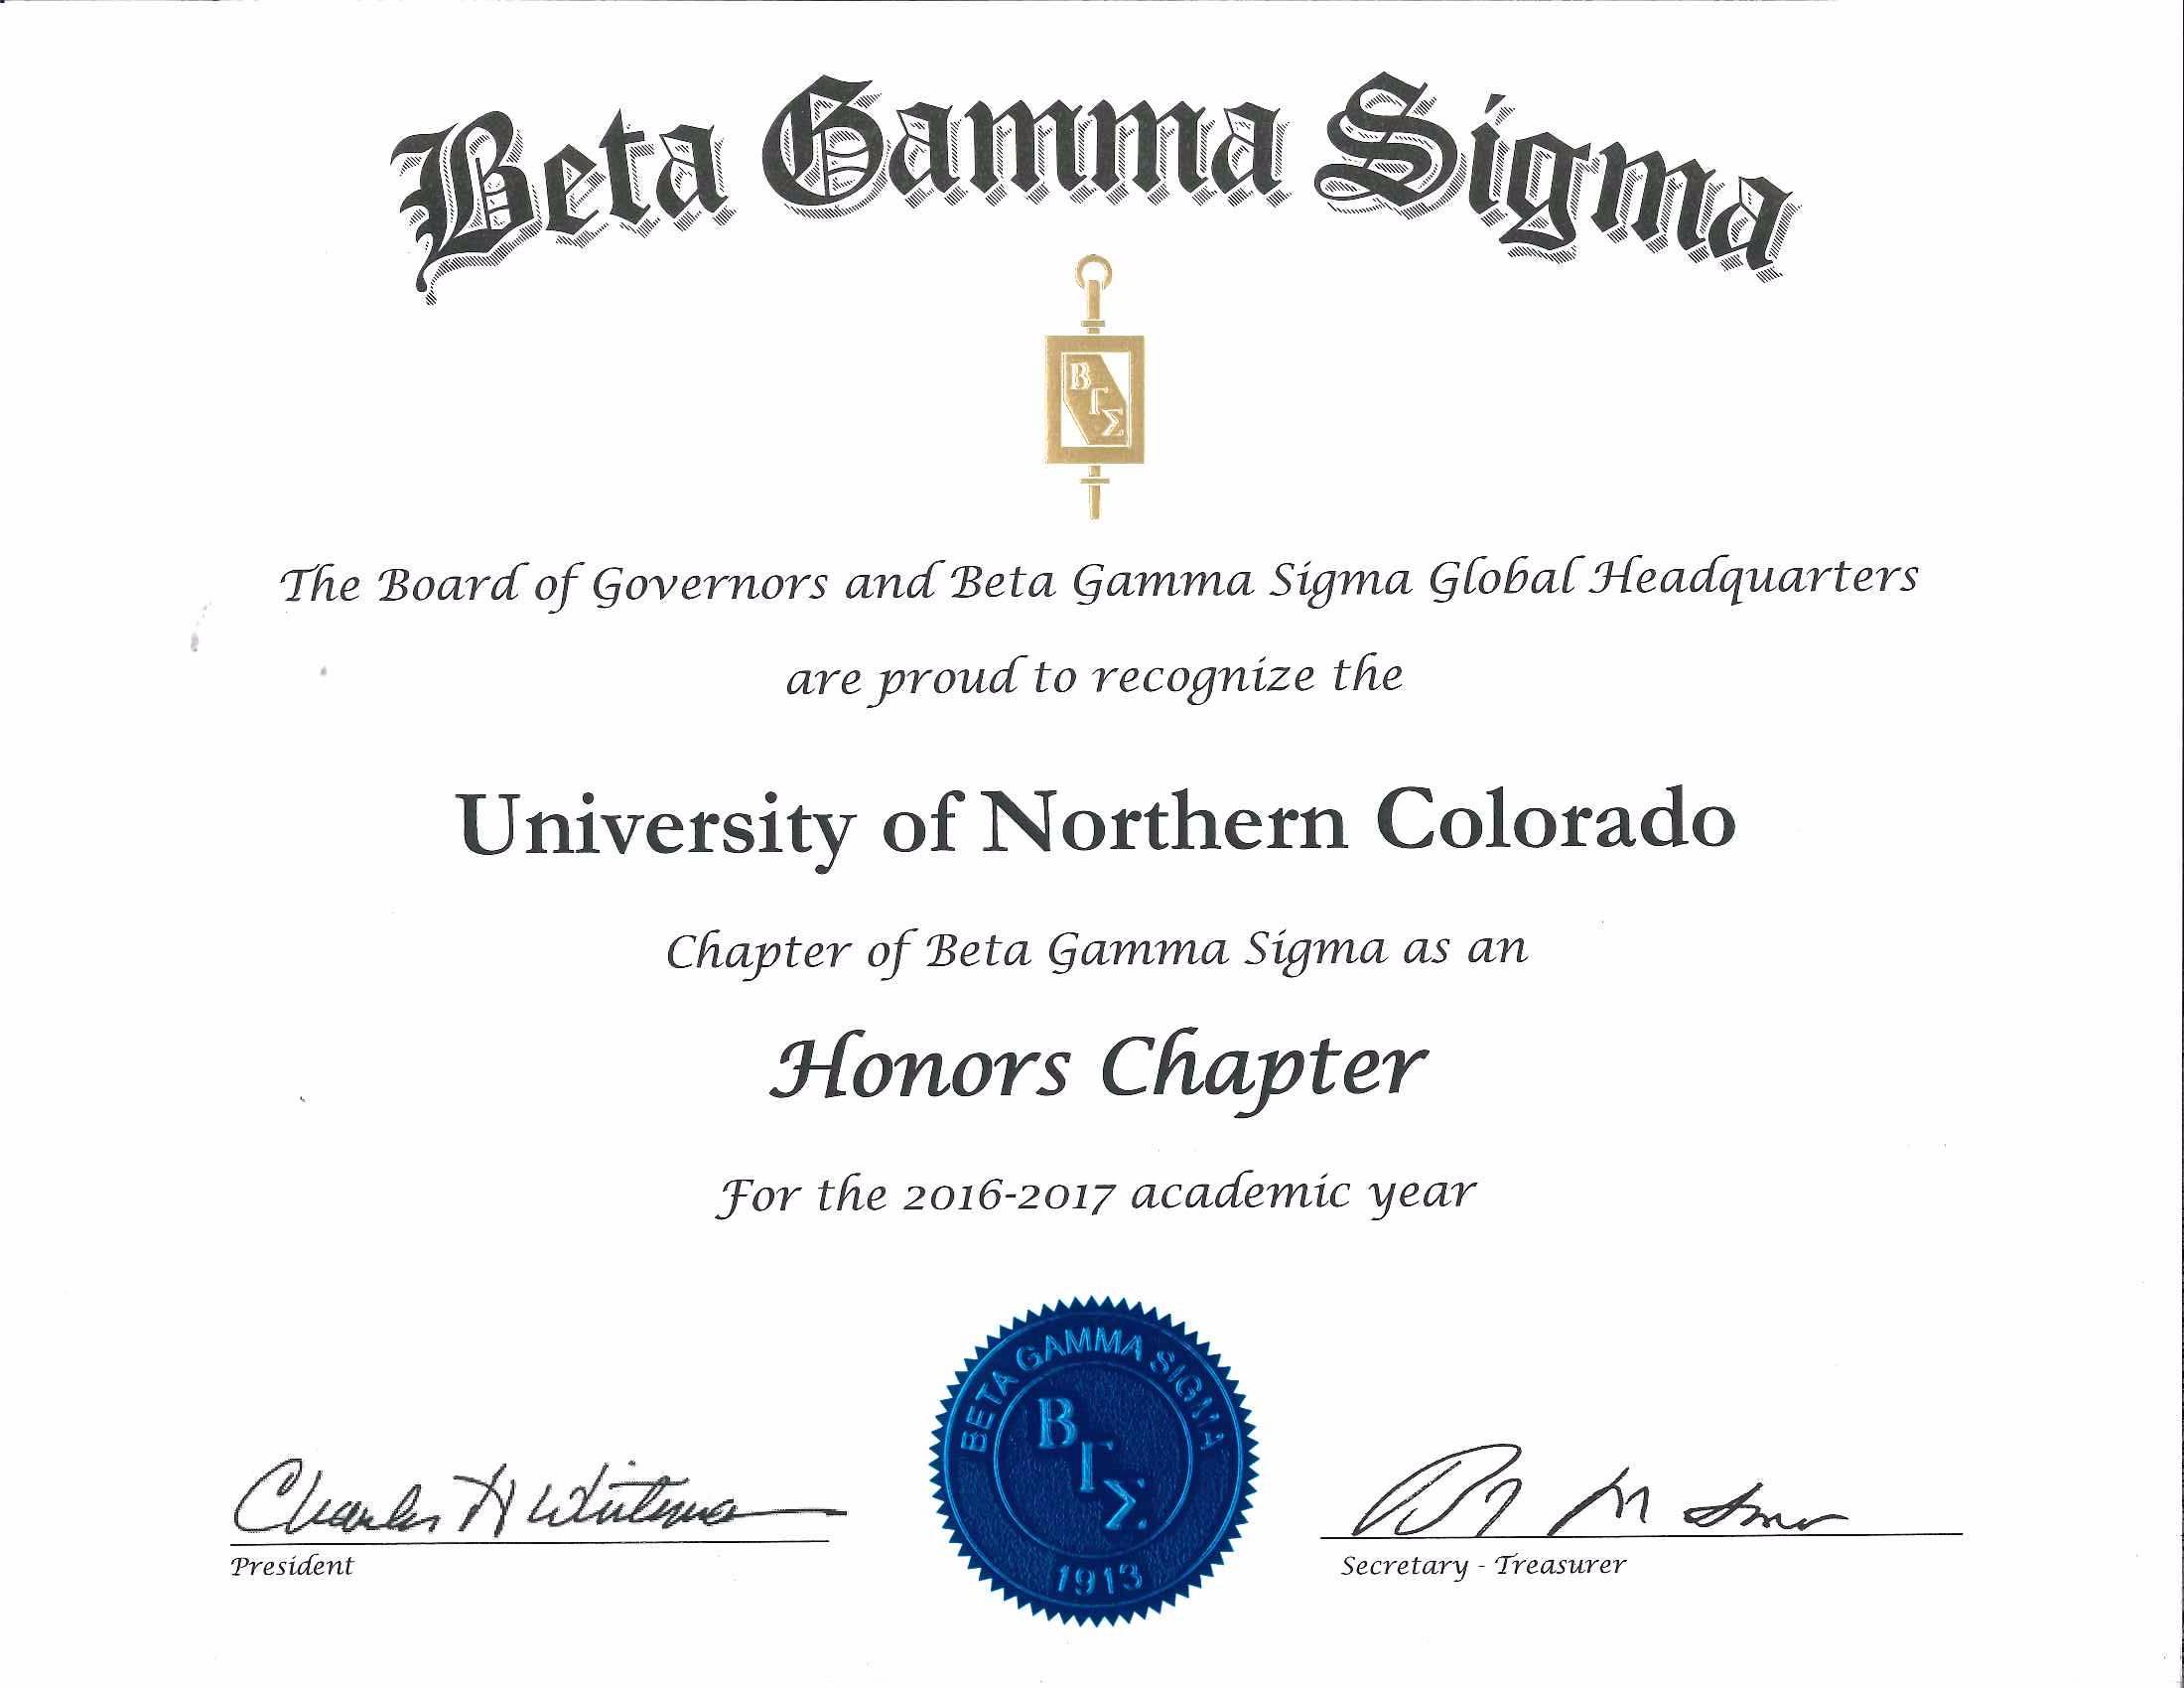 Beta Gamma Sigma Honors